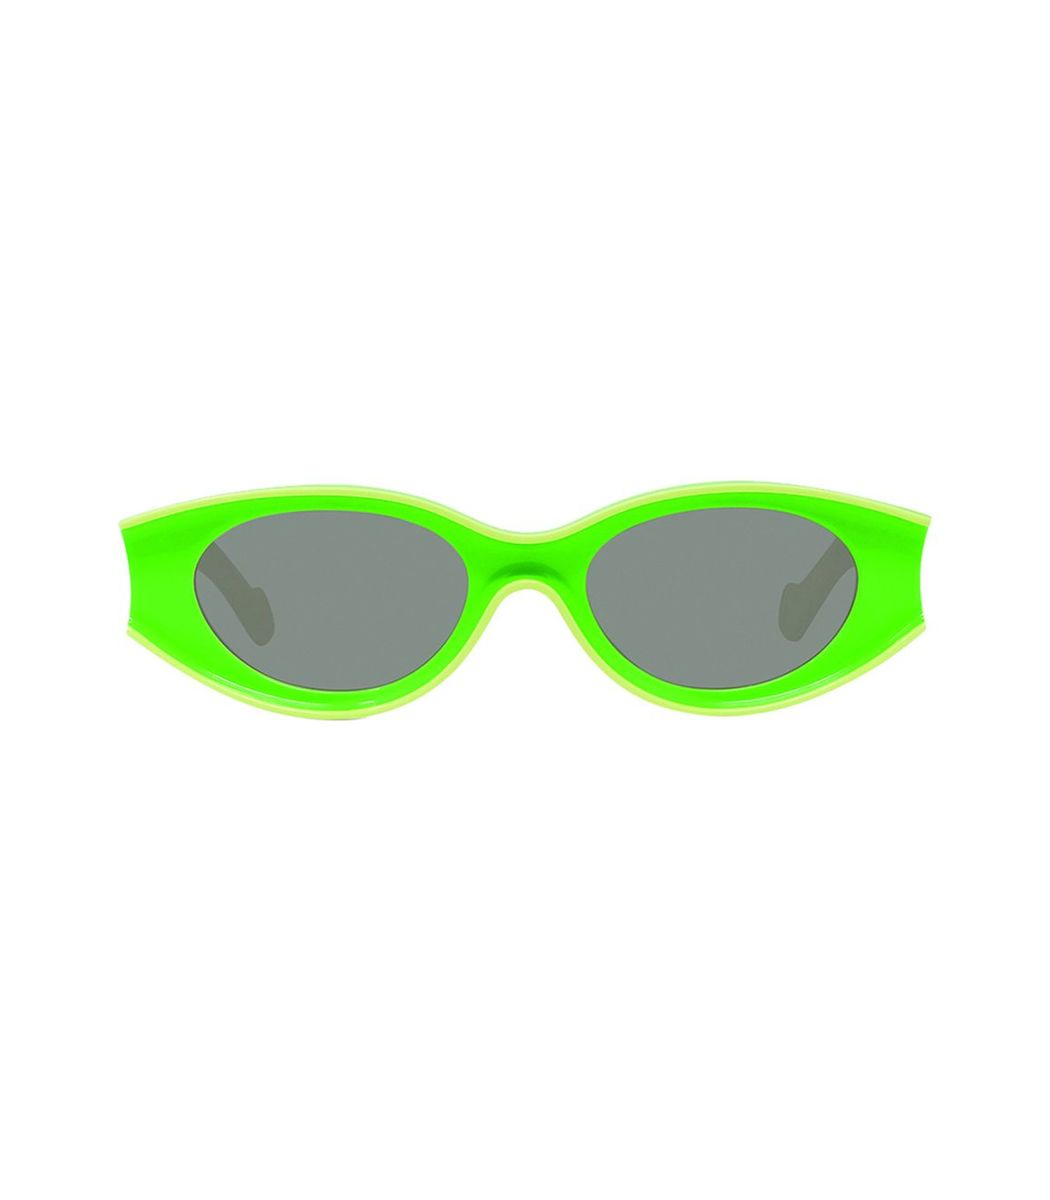 Loewe Fluorescent Green Small Oval Sunglasses